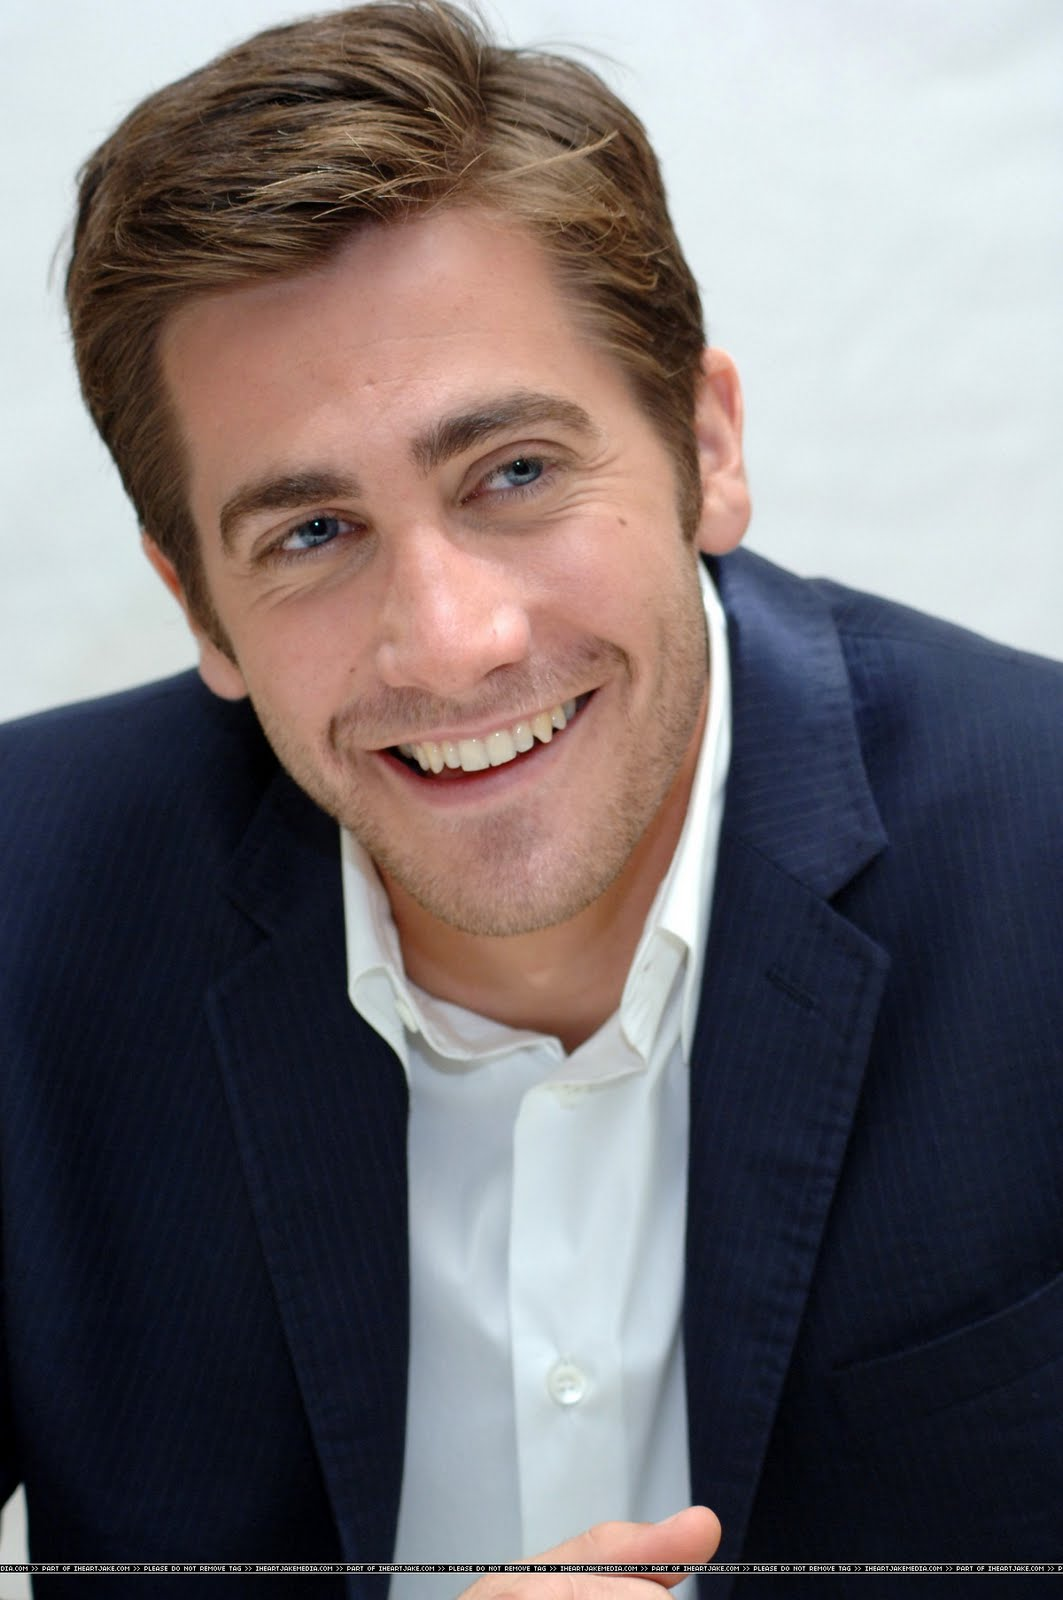 Jake Gyllenhaal's 20lbs weight loss to play Nightcrawler ... |Old Jake Gyllenhaal